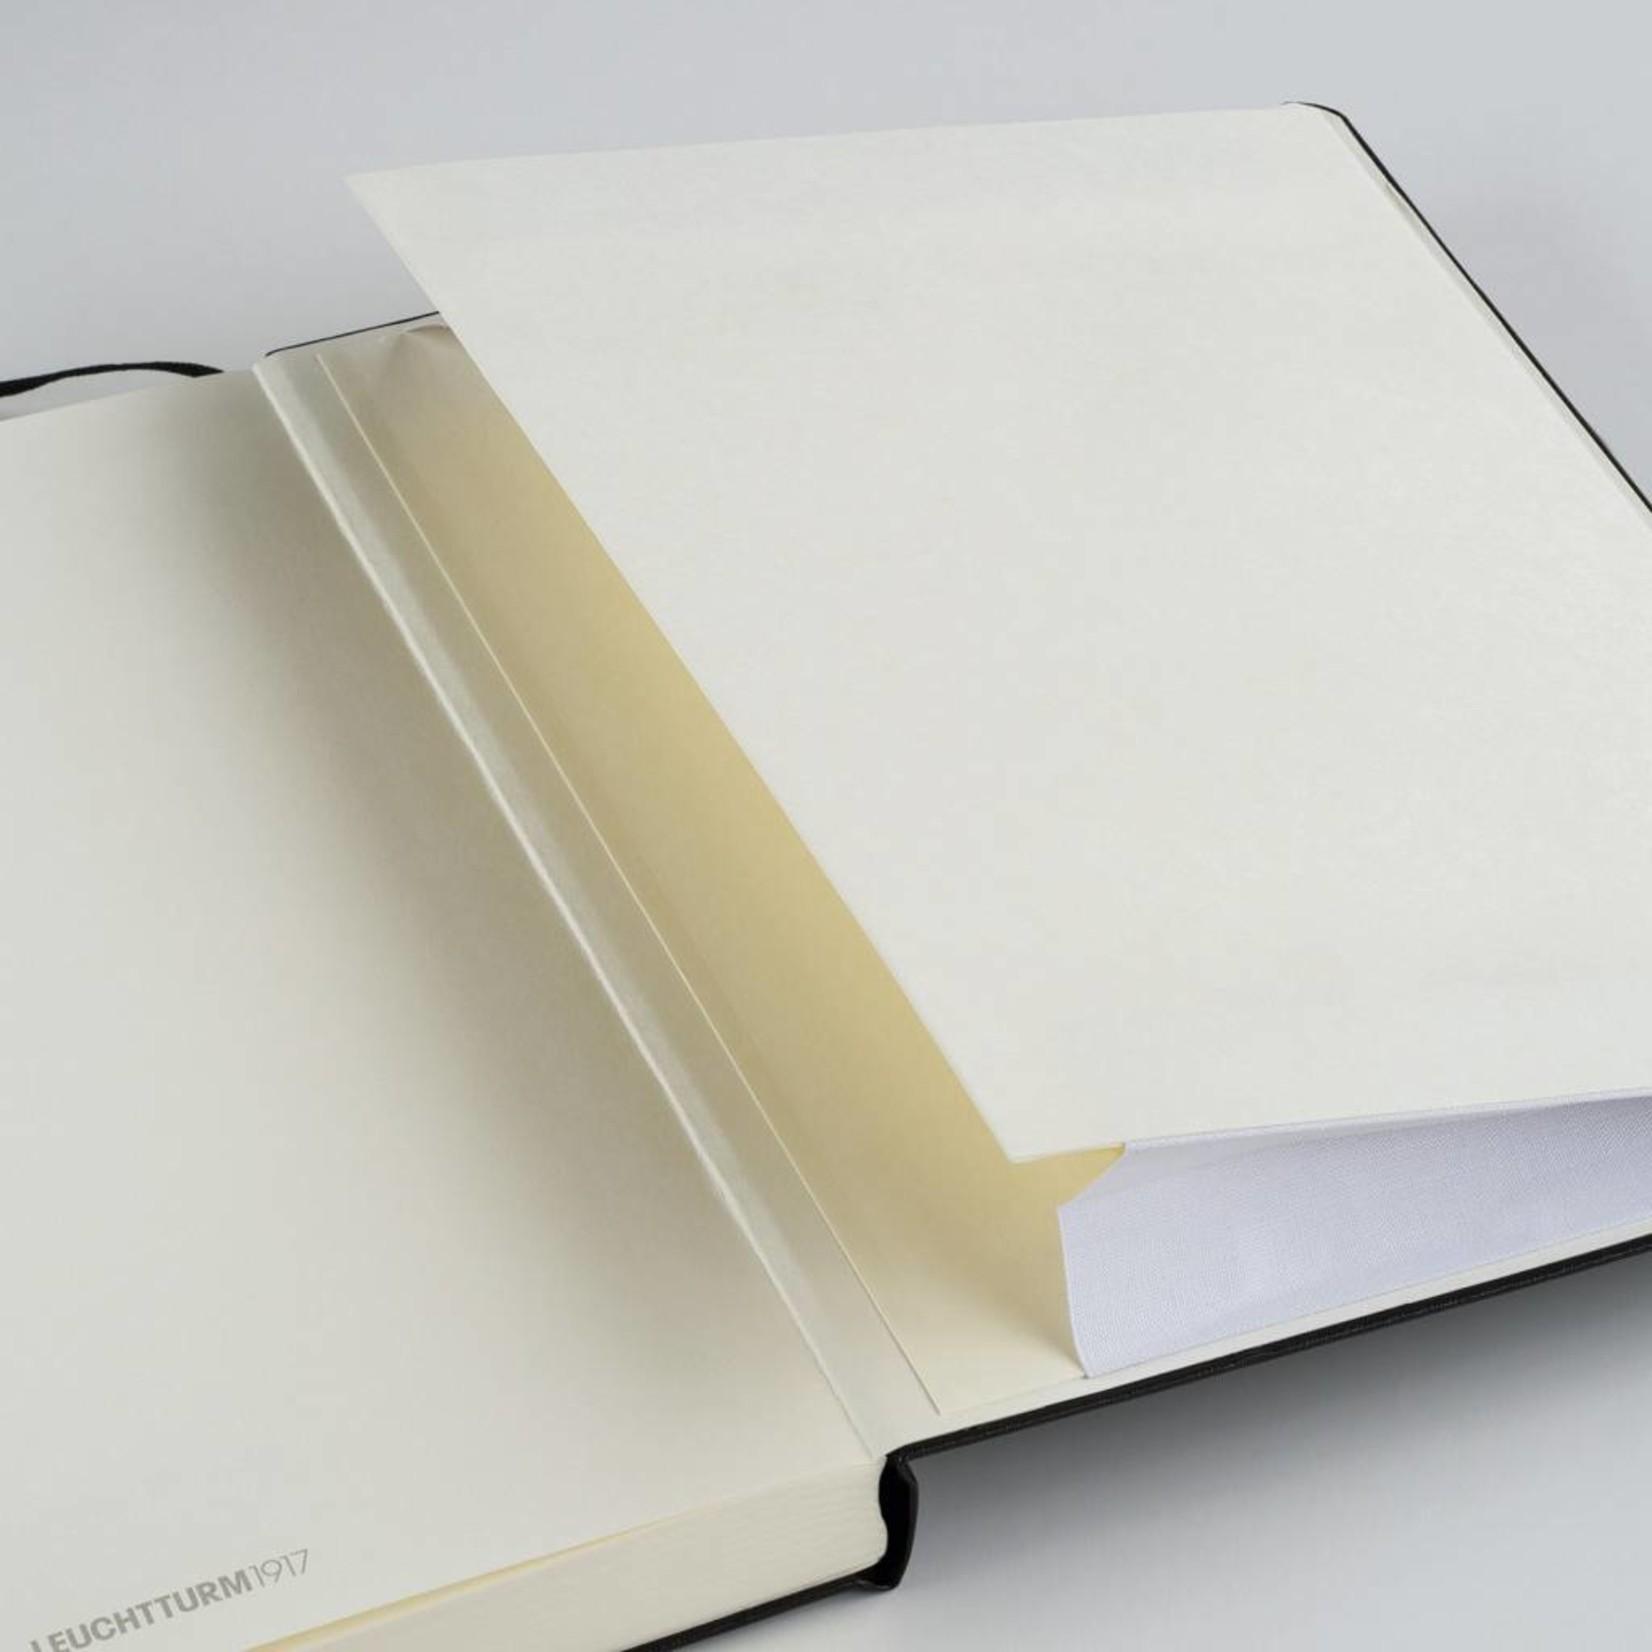 Leuchtturm1917 Leuchtturm1917 Notizbuch Softcover, Medium, Schwarz, Liniert